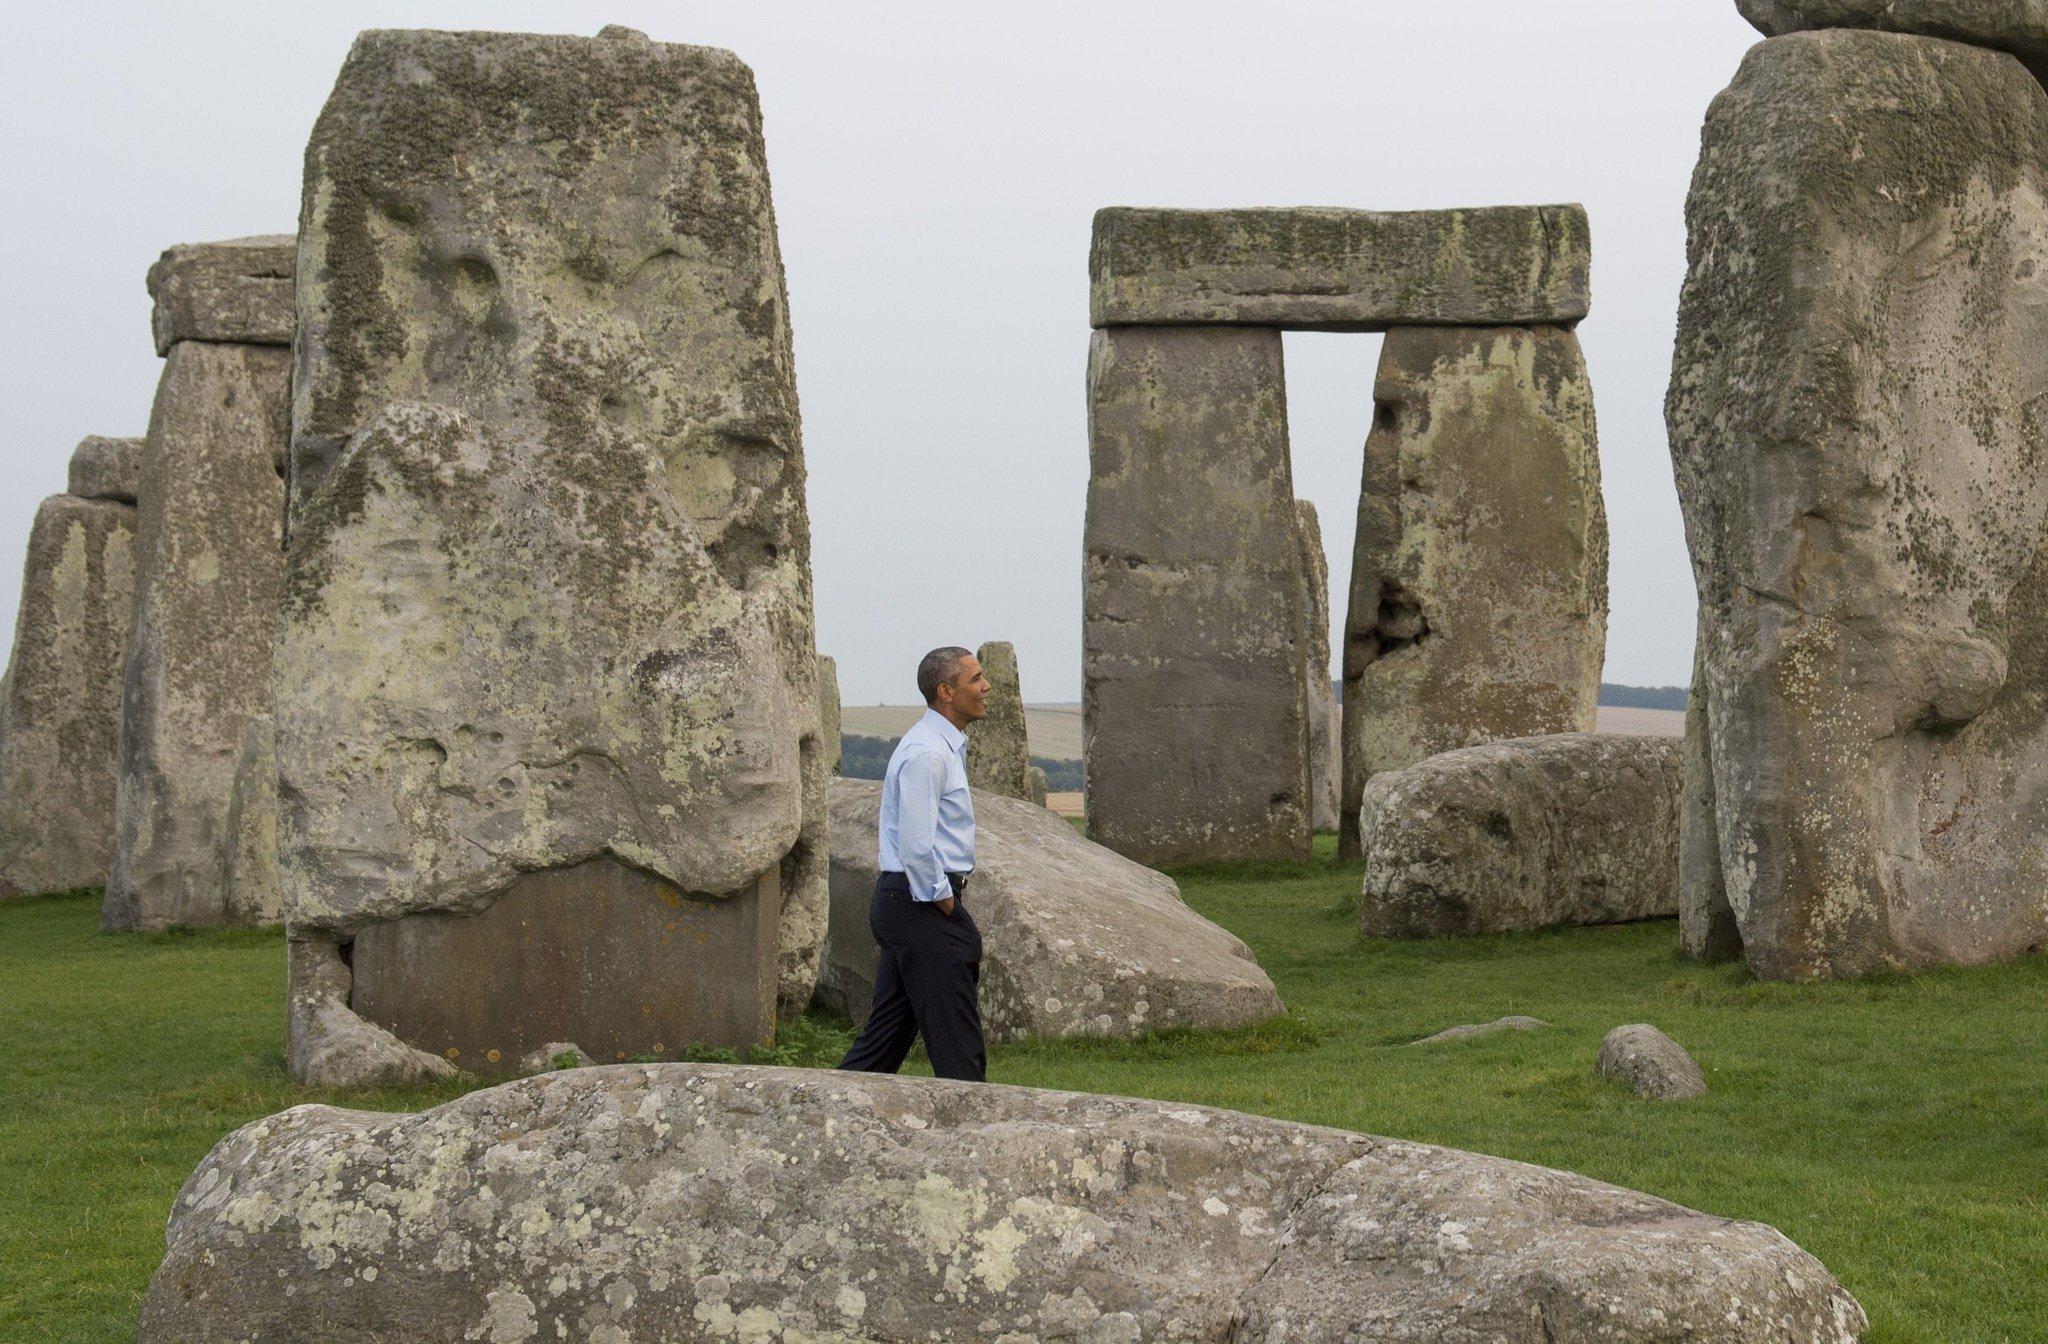 Obama makes surprise visit to Stonehenge - Capital Gazette